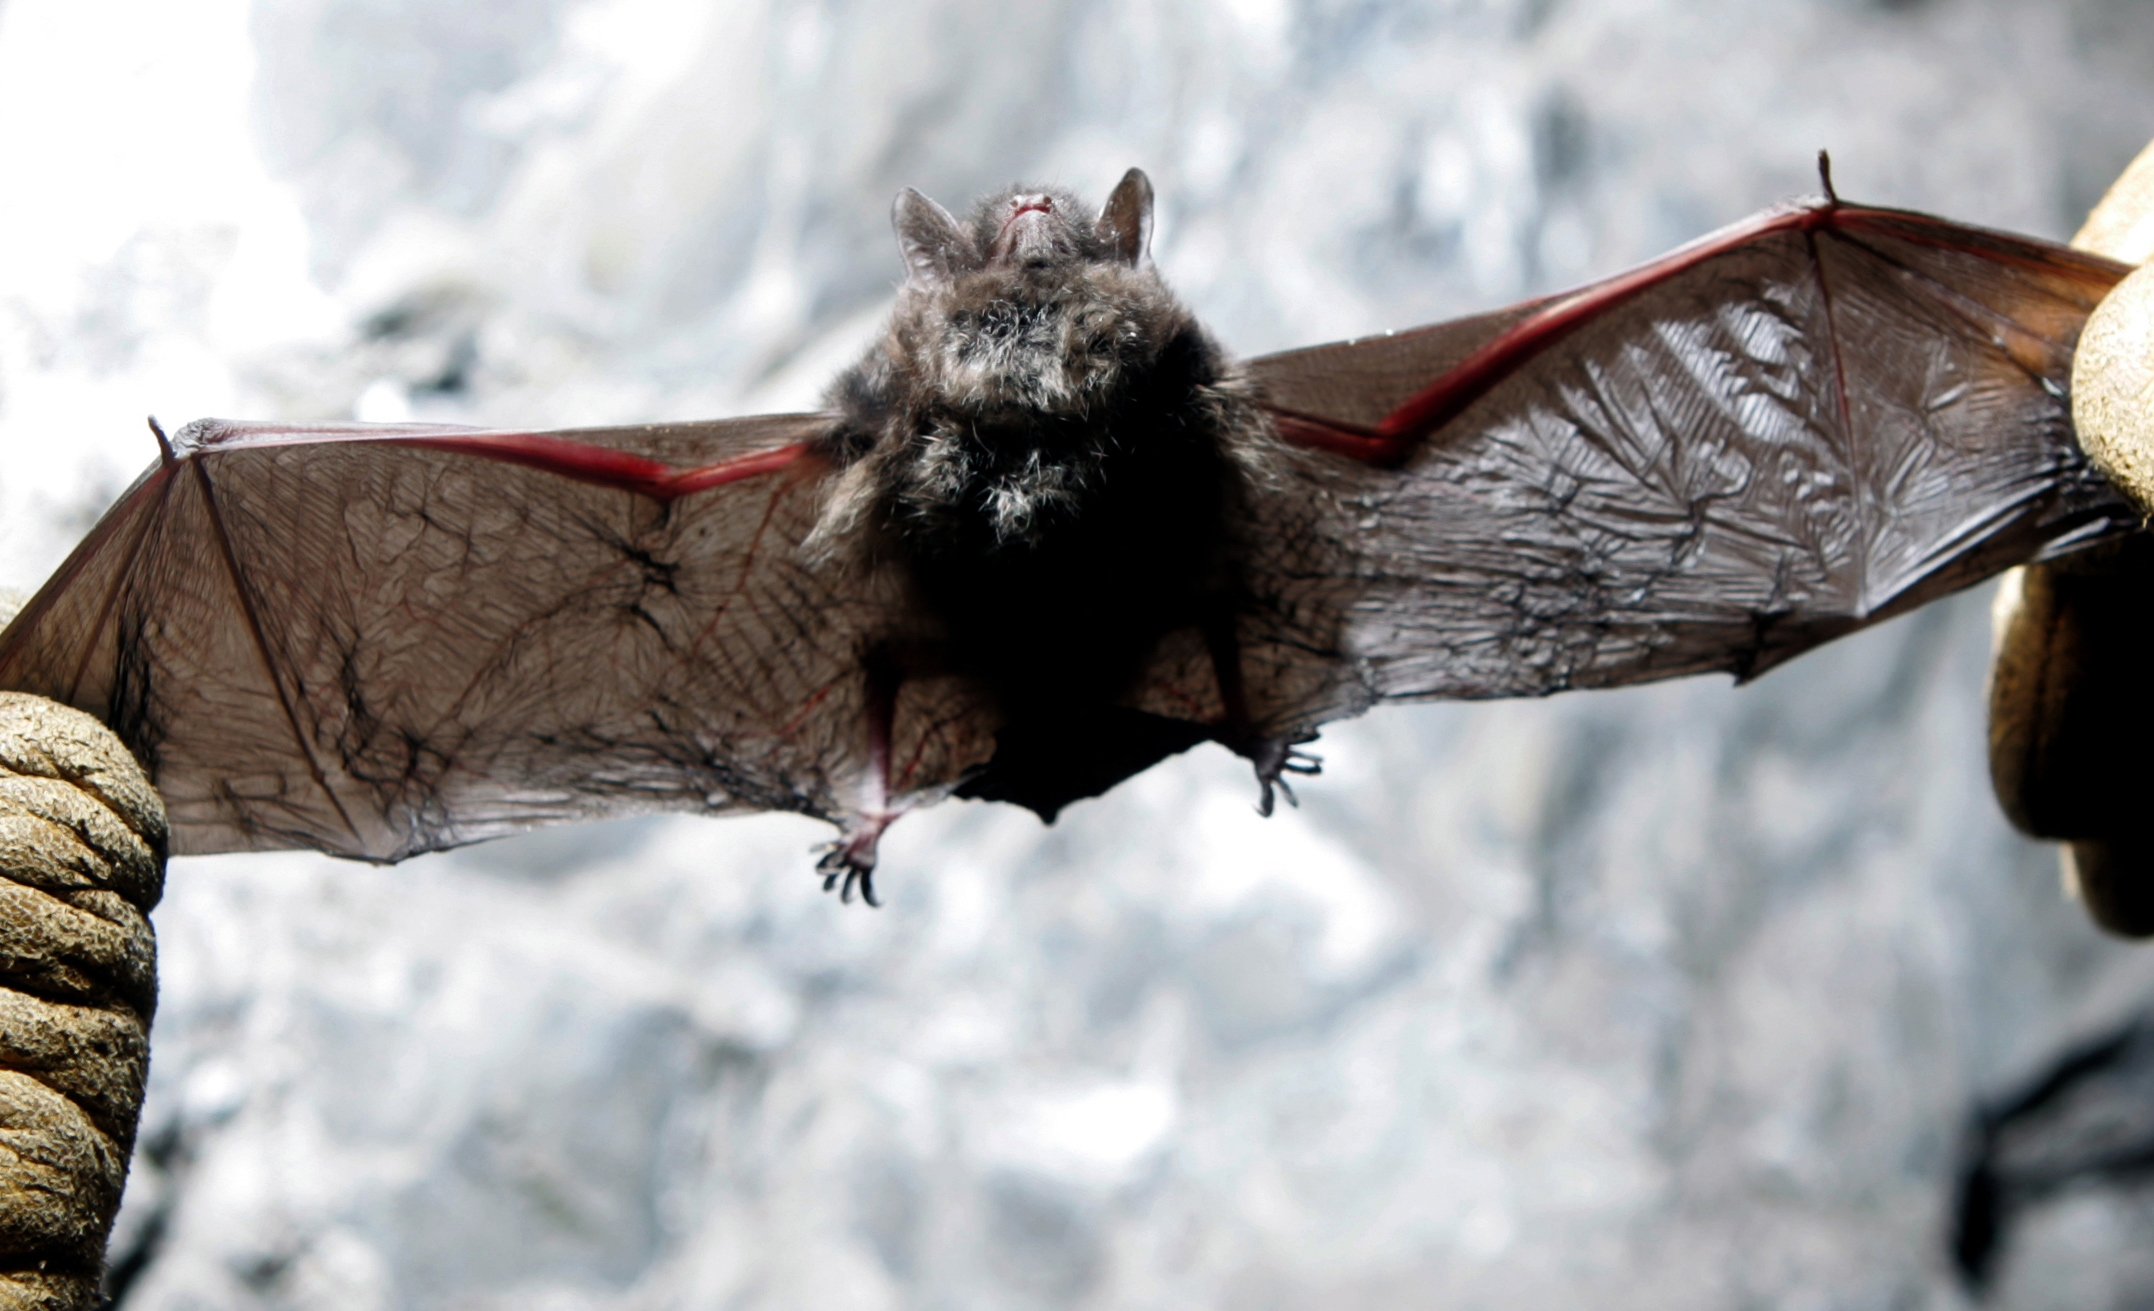 Bat With White Nose Syndrome Found In Washington The